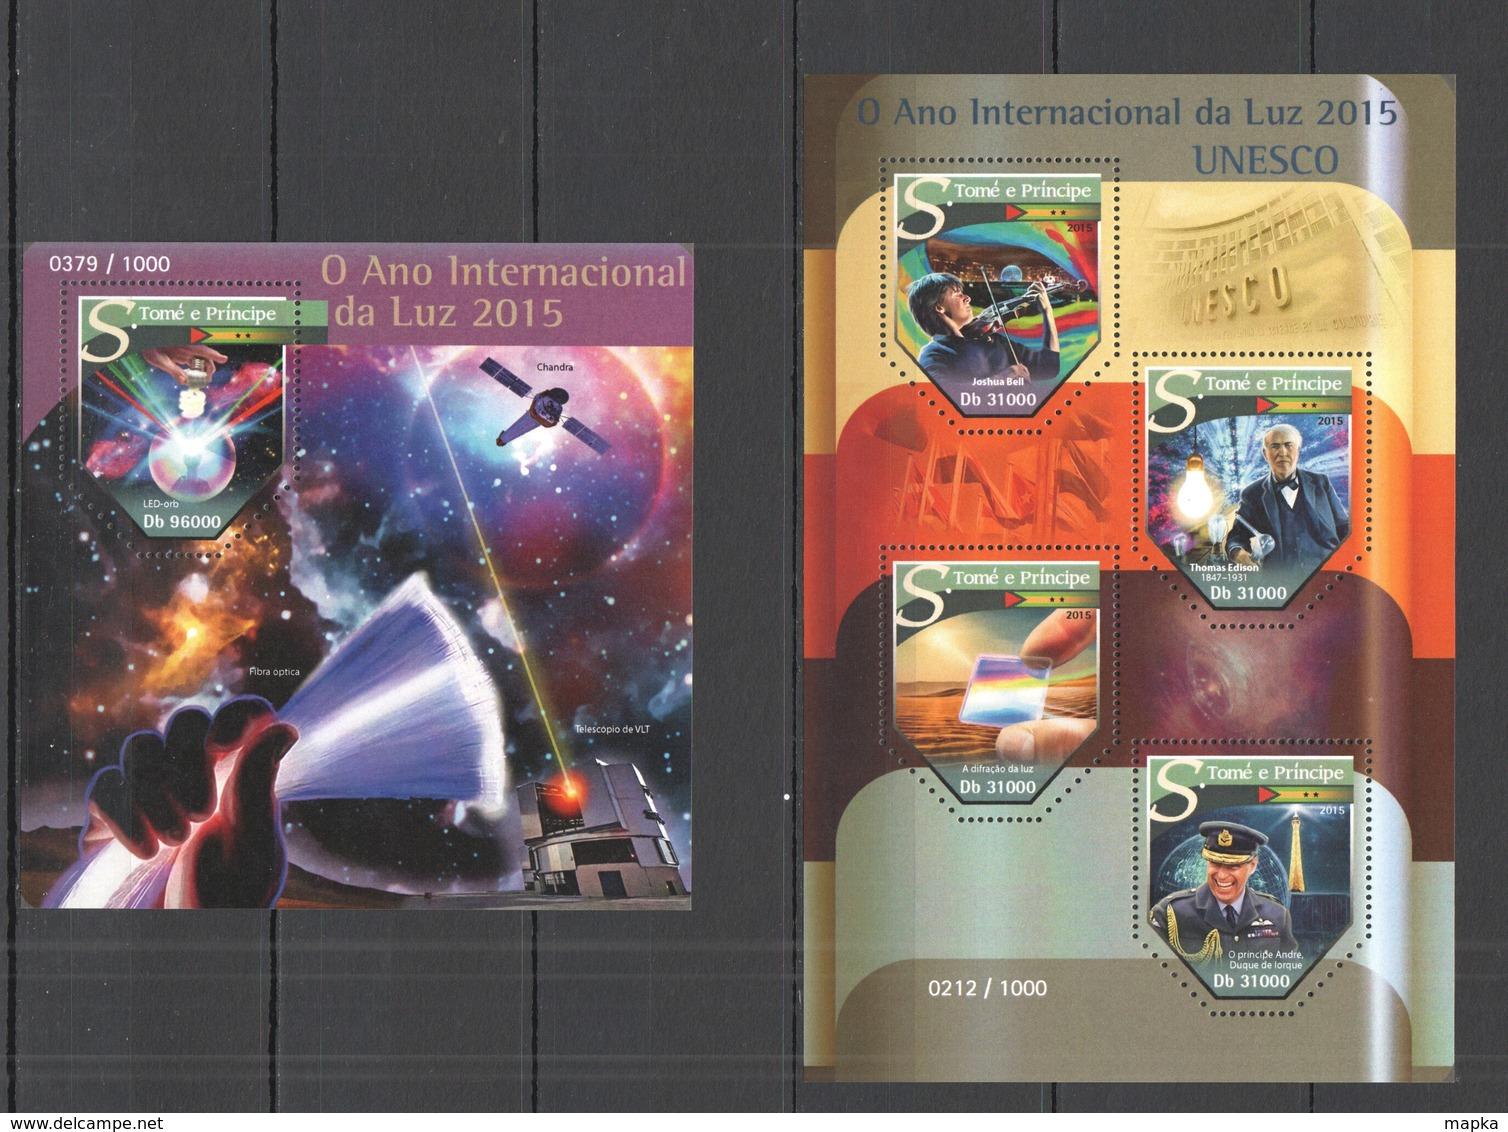 ST1489 2015 S. TOME E PRINCIPE THE INTERNATIONAL YEAR OF LIGHT UNESCO KB+BL MNH - Physics